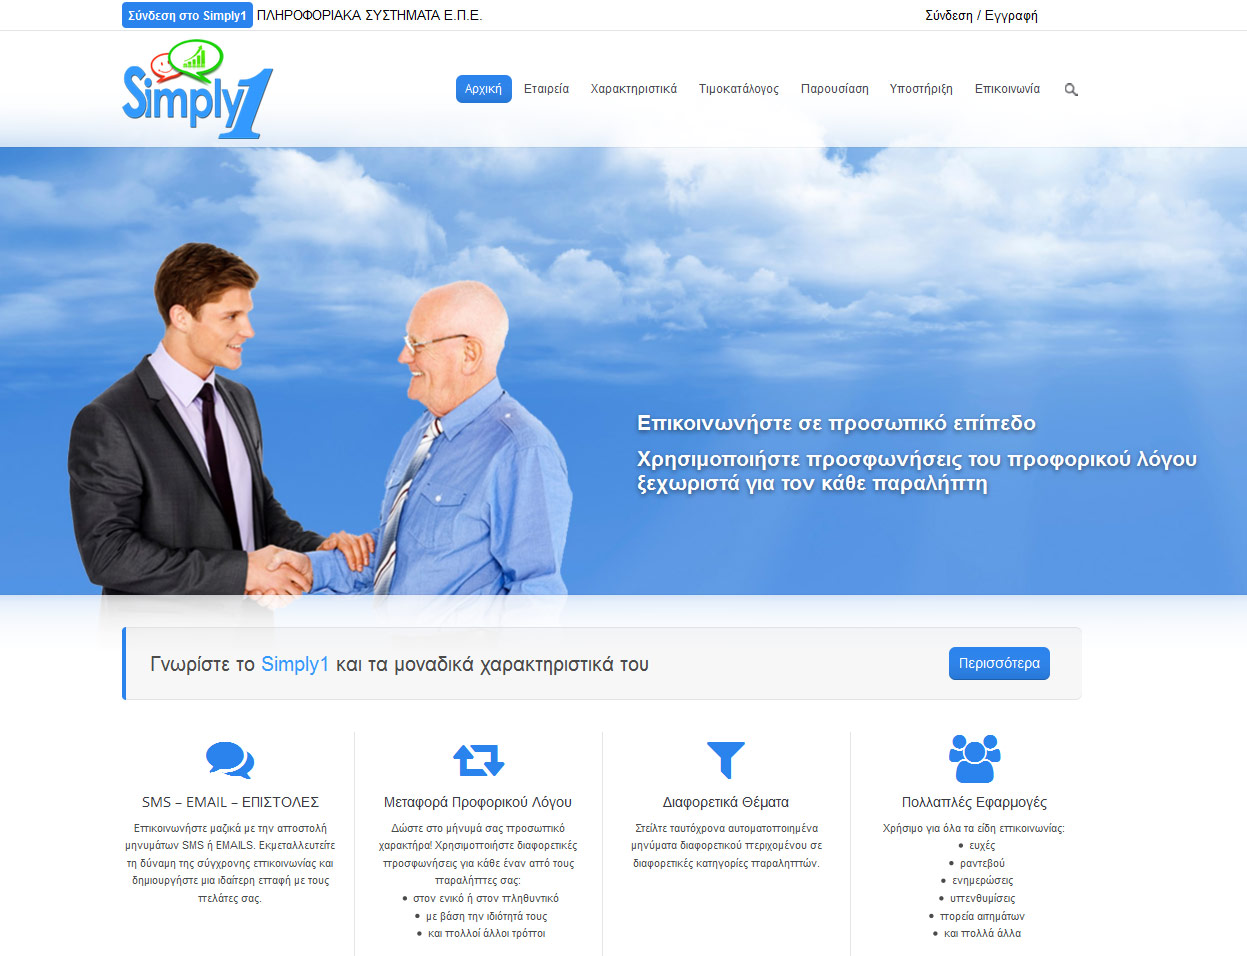 Simply1 - Επικοινωνιακό πρόγραμμα